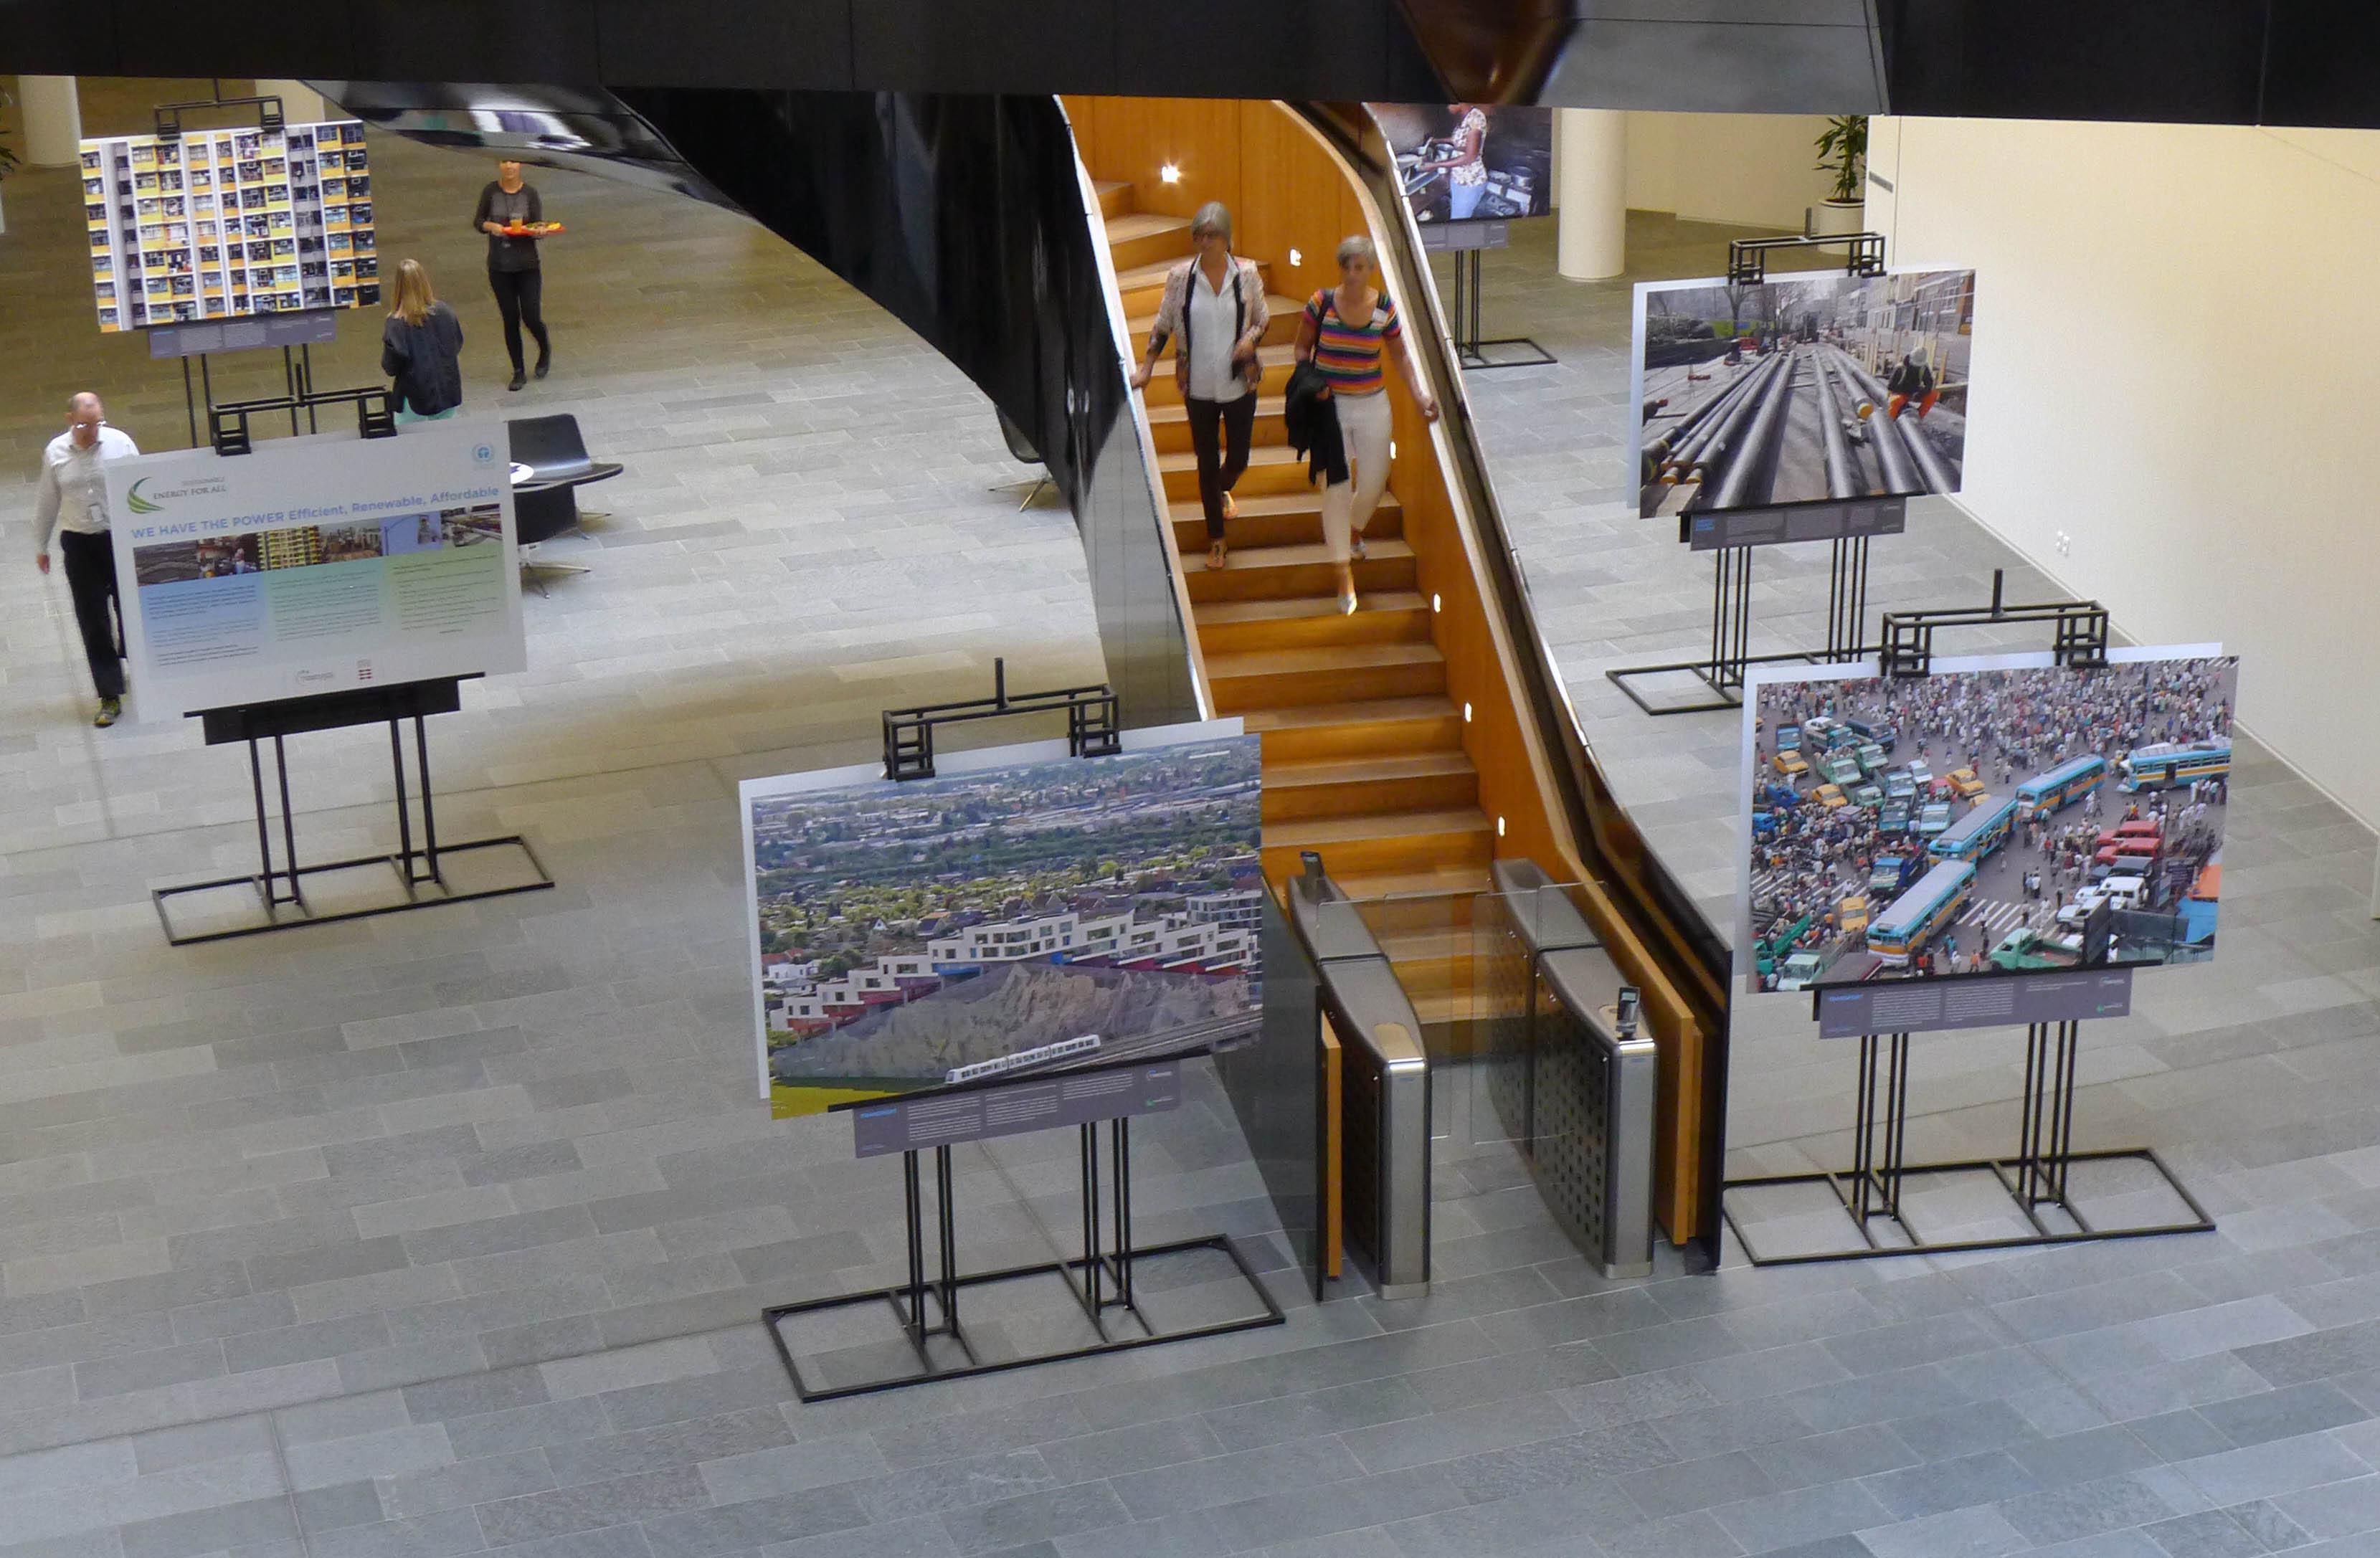 Exhibition for The Copenhagen Centre on Energy Efficiency